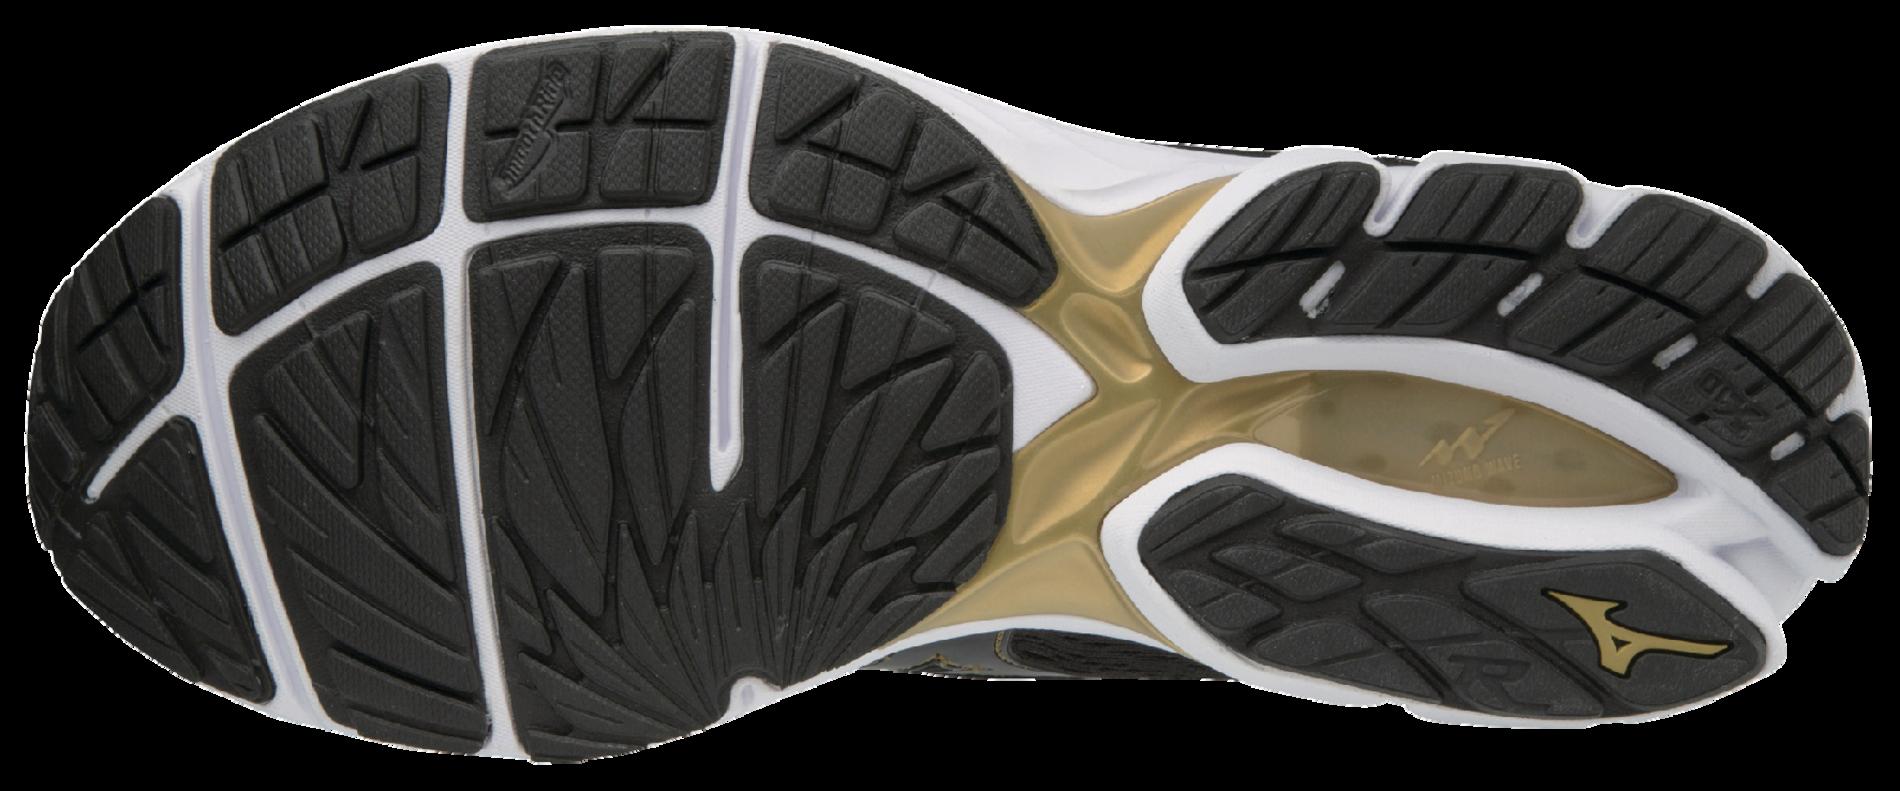 Mizuno Mens Running Shoes - Men's Wave Rider 22 Running Shoe - 410991